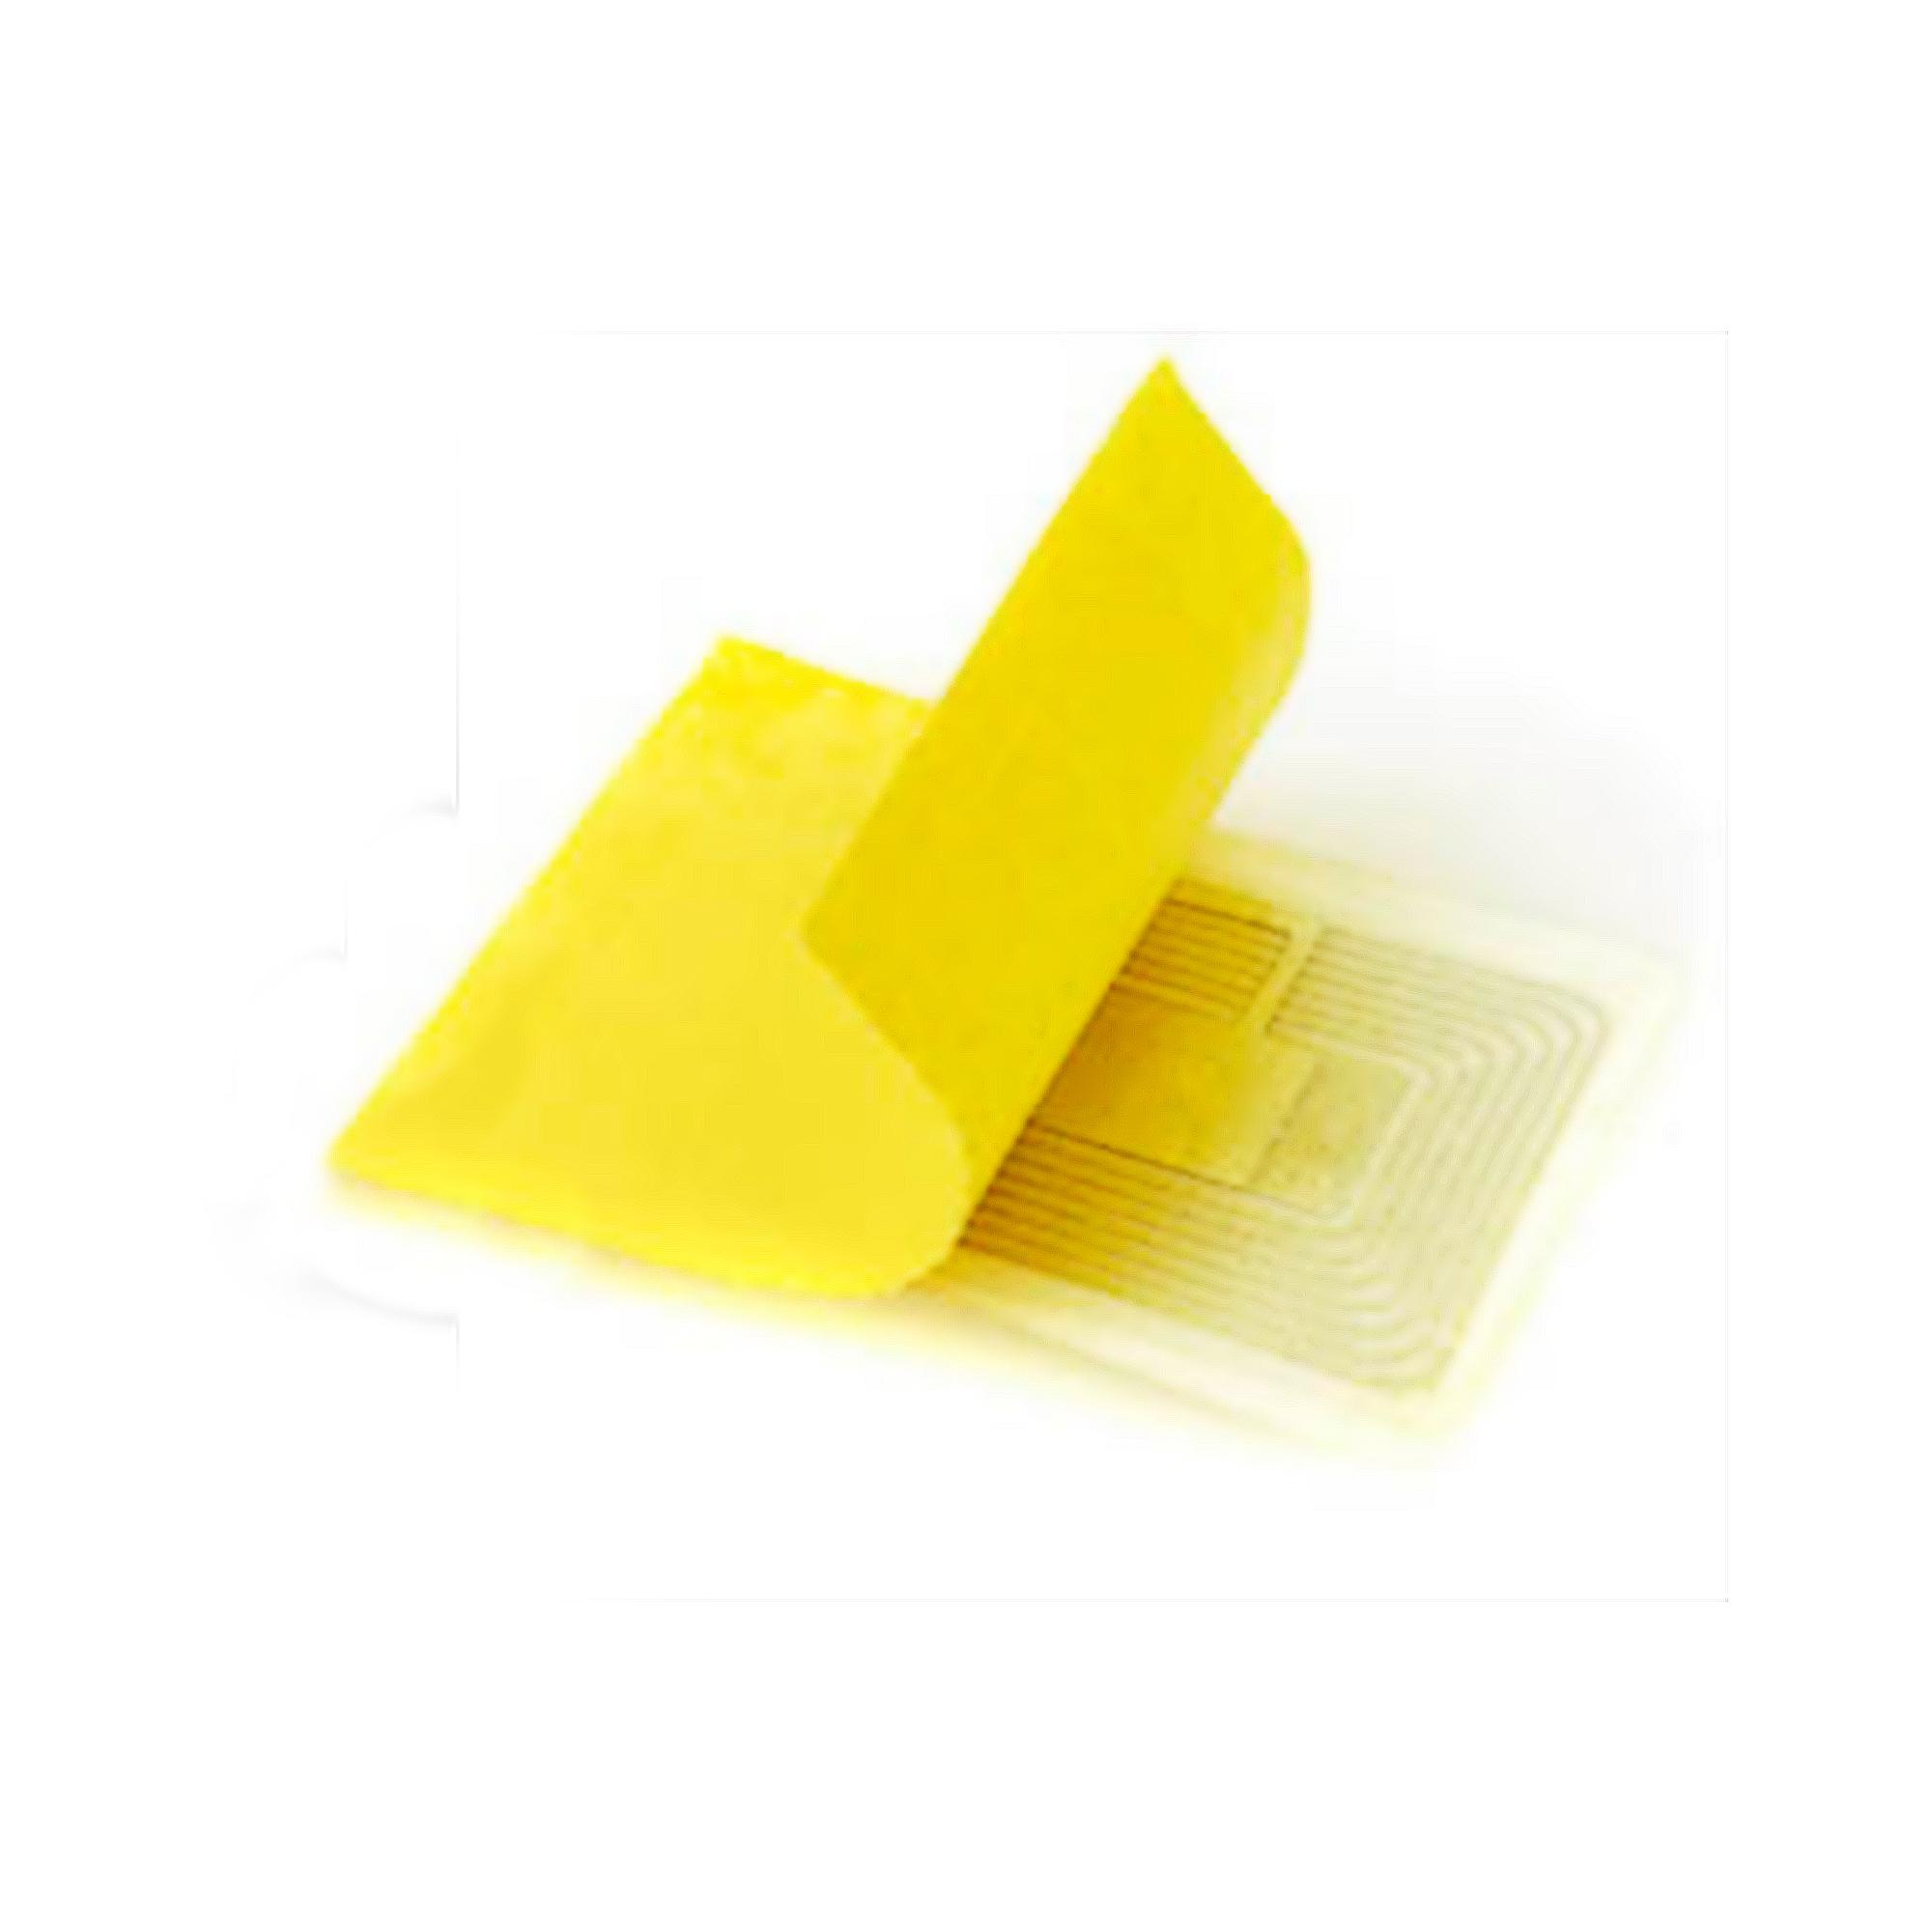 RFID-мітка Mifare Ultralight EV1 на самоклейках (паперова)